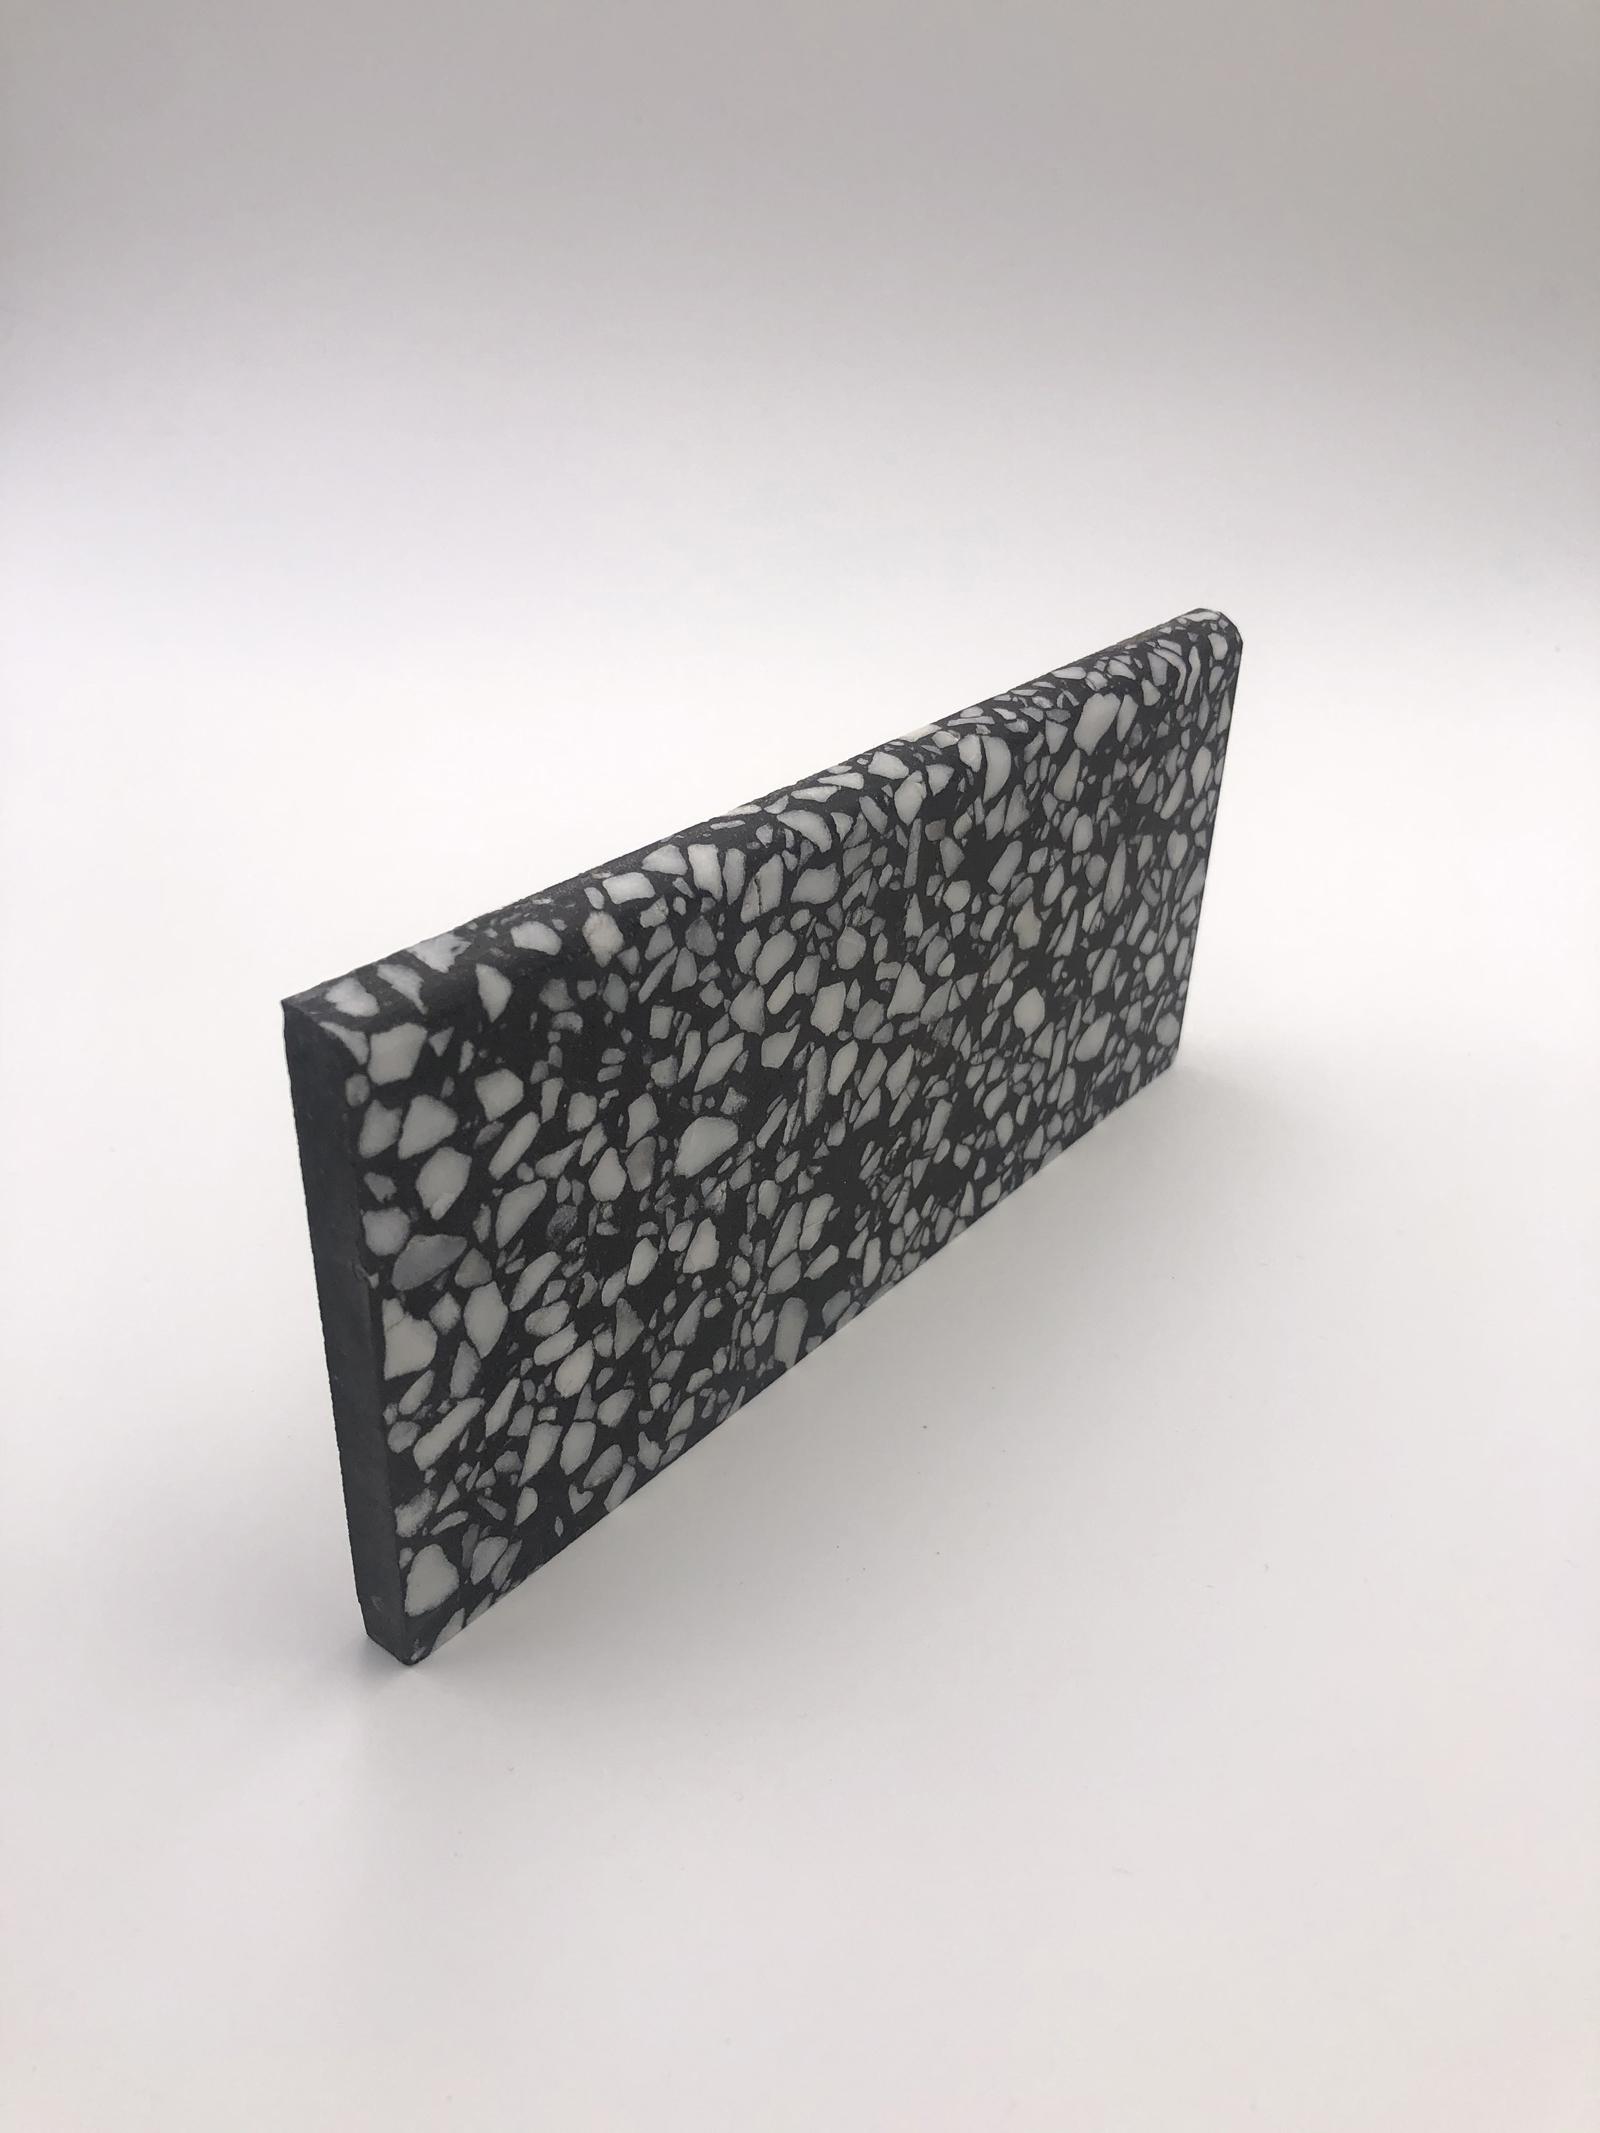 zementfliesen-terrazzofliesen-kreidefarbe-terrazzo-fugenlos-viaplatten-moodbild-900060w | N° 900060w - Sockel Terrazzo GROB